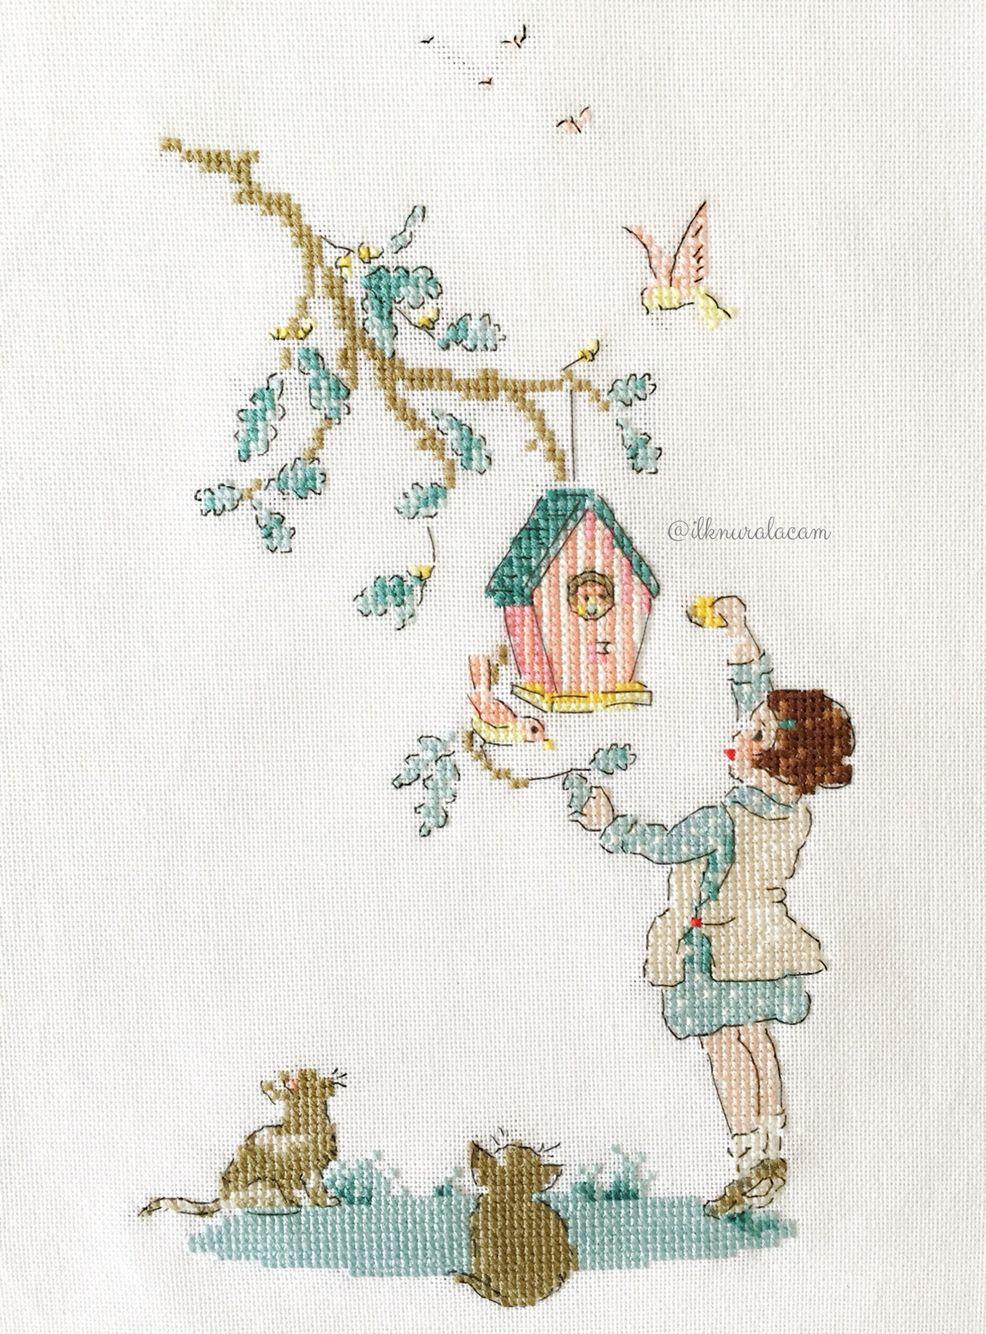 helene le berre le langage des fleurs helene le berre pinterest cross stitch stitch and. Black Bedroom Furniture Sets. Home Design Ideas